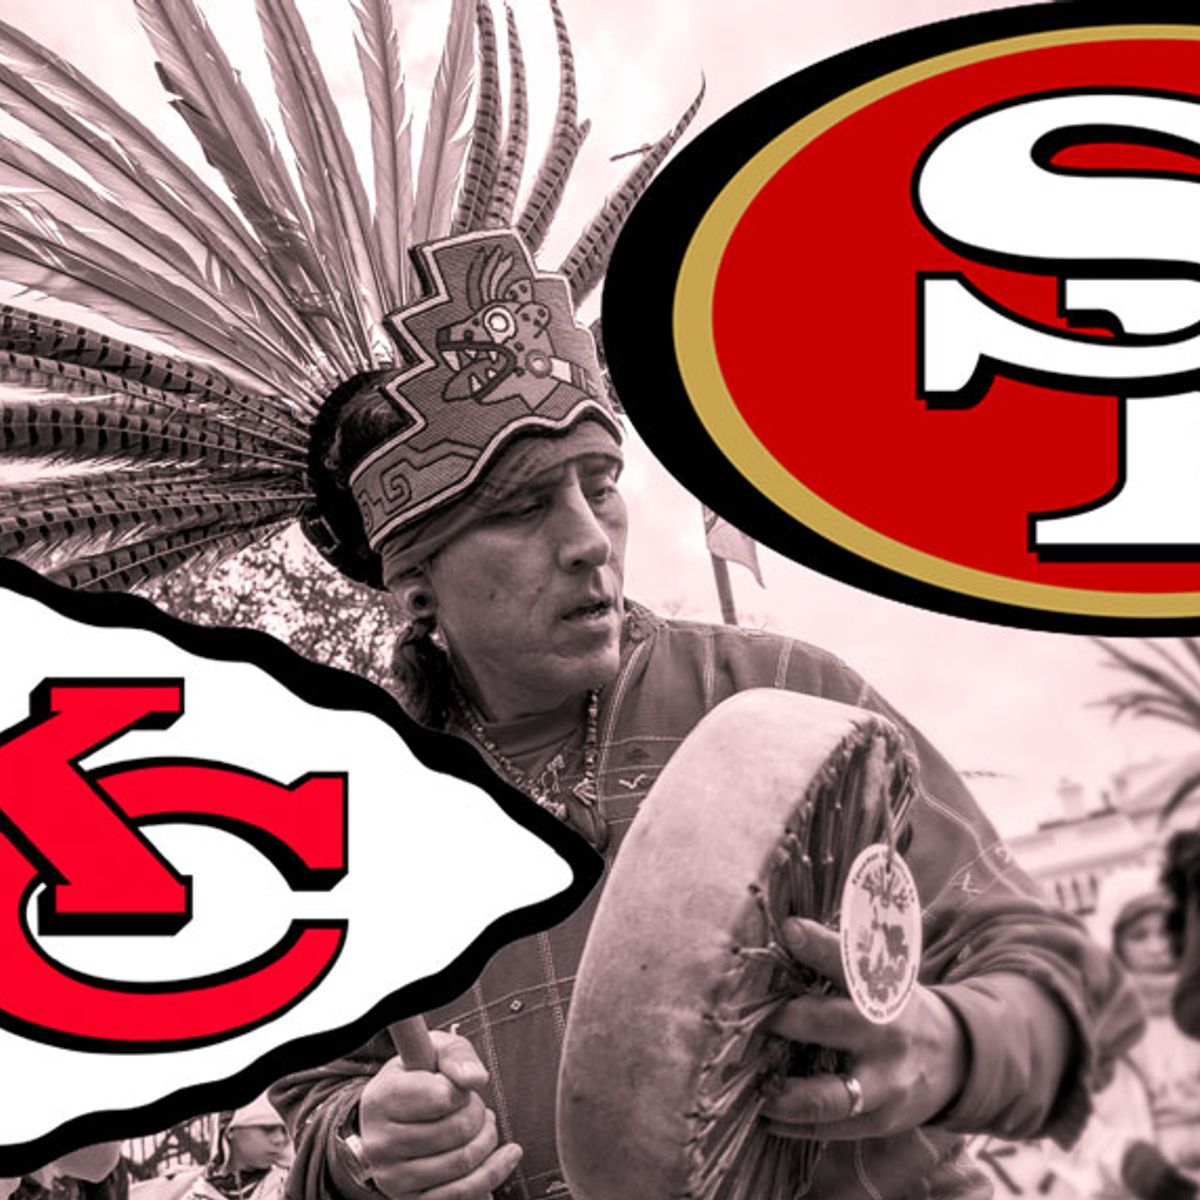 Both Super Bowl LIV team names are pretty racist — Kansas City Chiefs and San Francisco 49ers